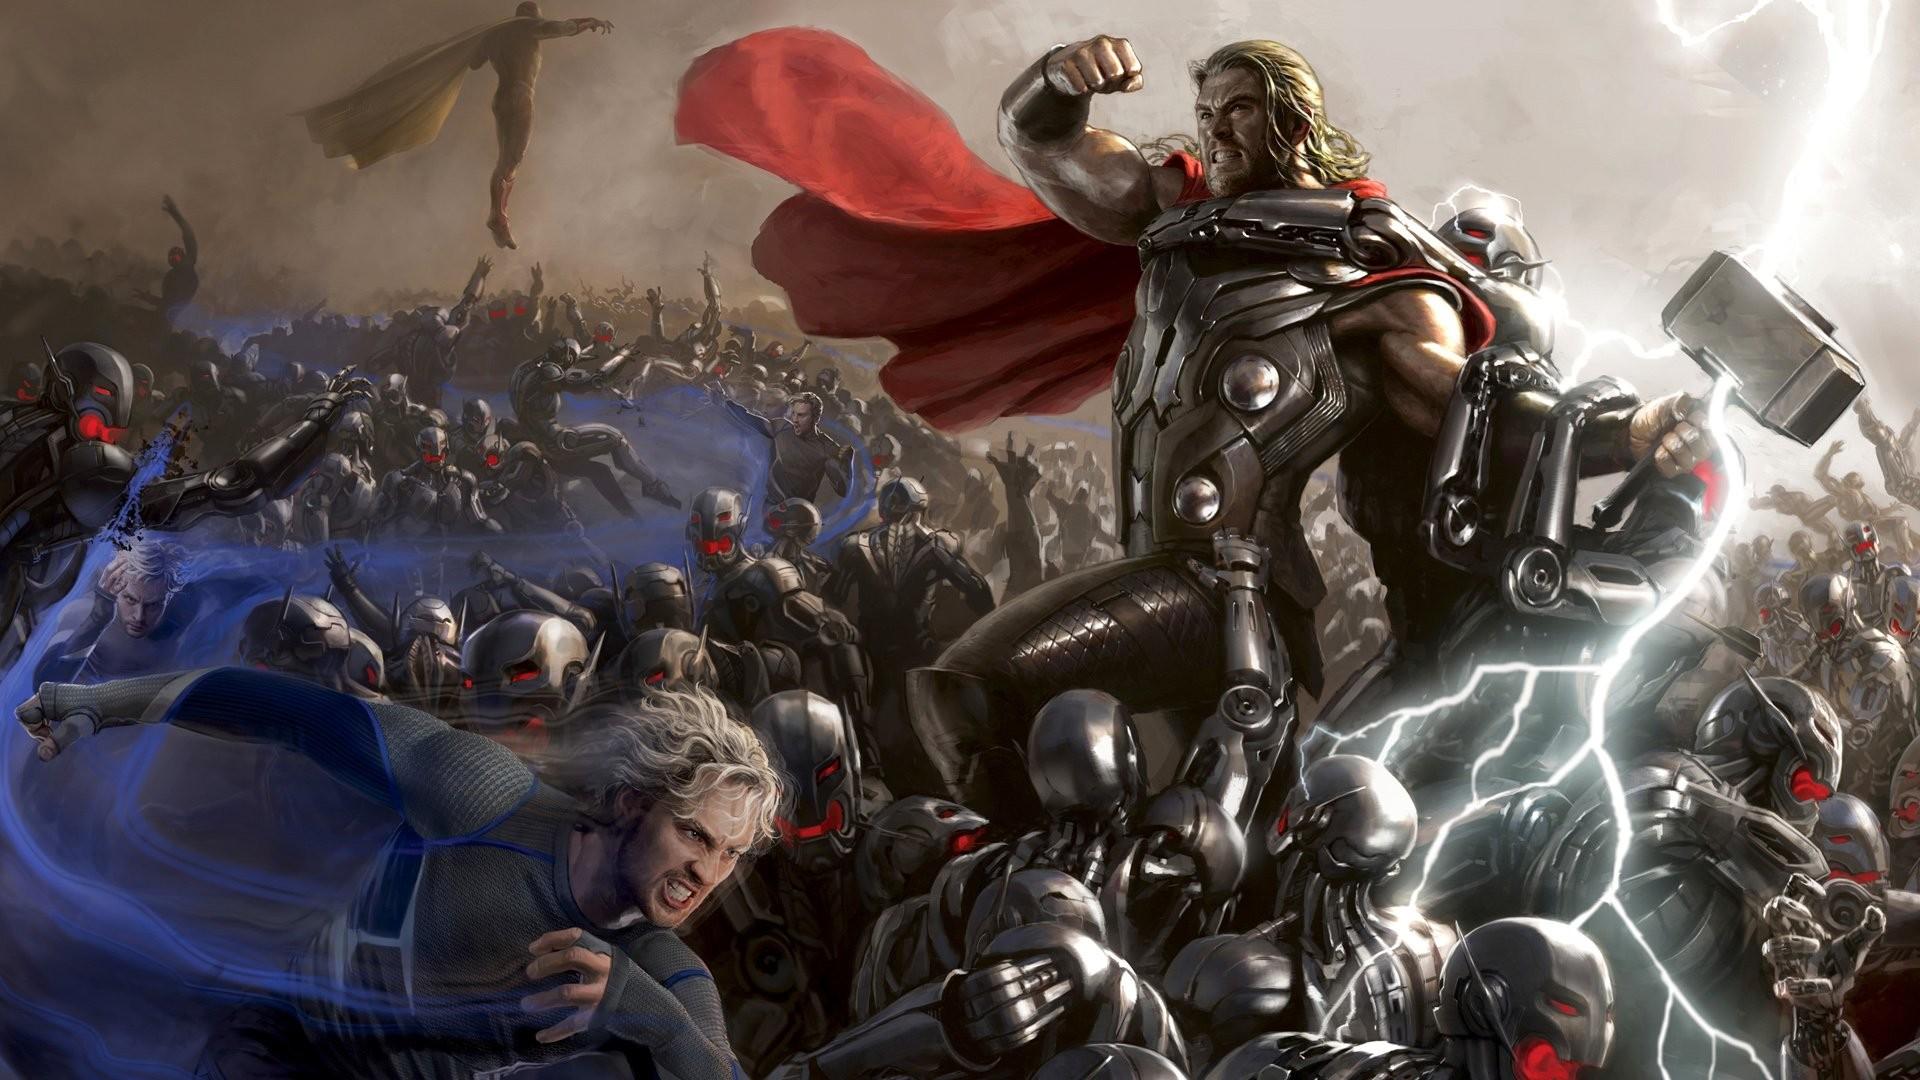 AVENGERS AGE OF ULTRON superhero action adventure comics marvel wallpaper |  | 522972 | WallpaperUP